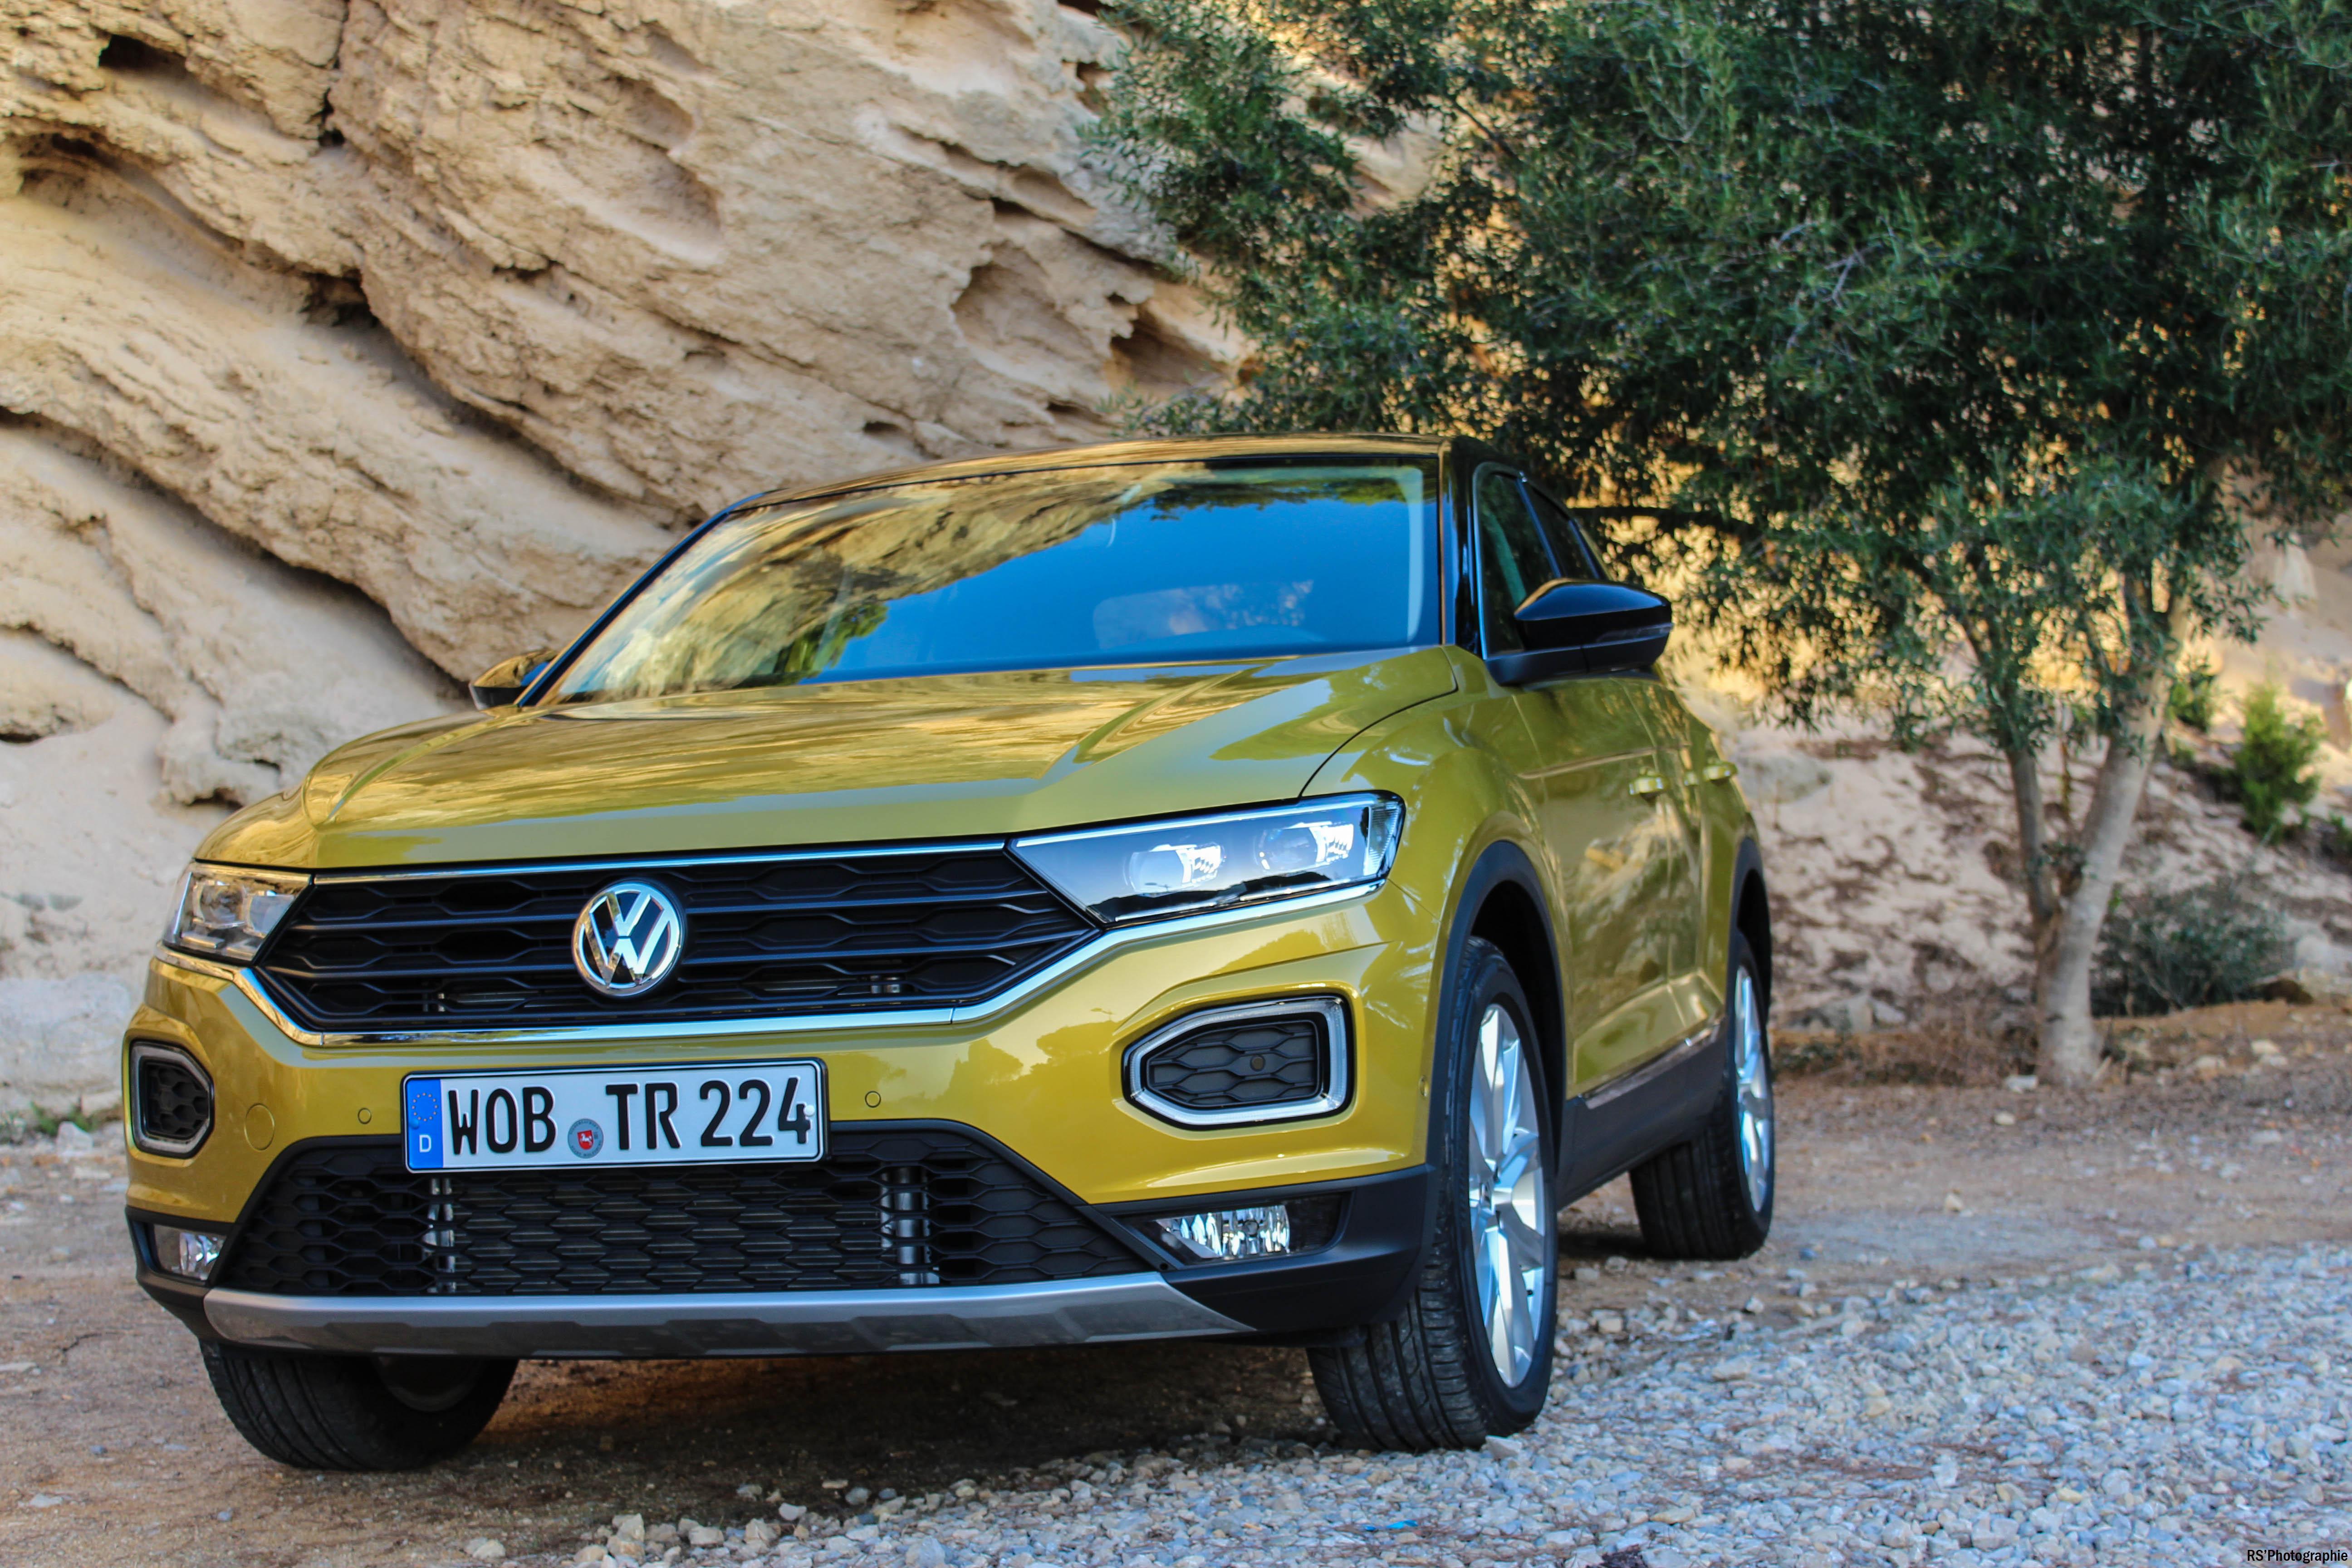 Volkswagentroc67-vw-t-roc-avant-front-Arnaud Demasier-RSPhotographie